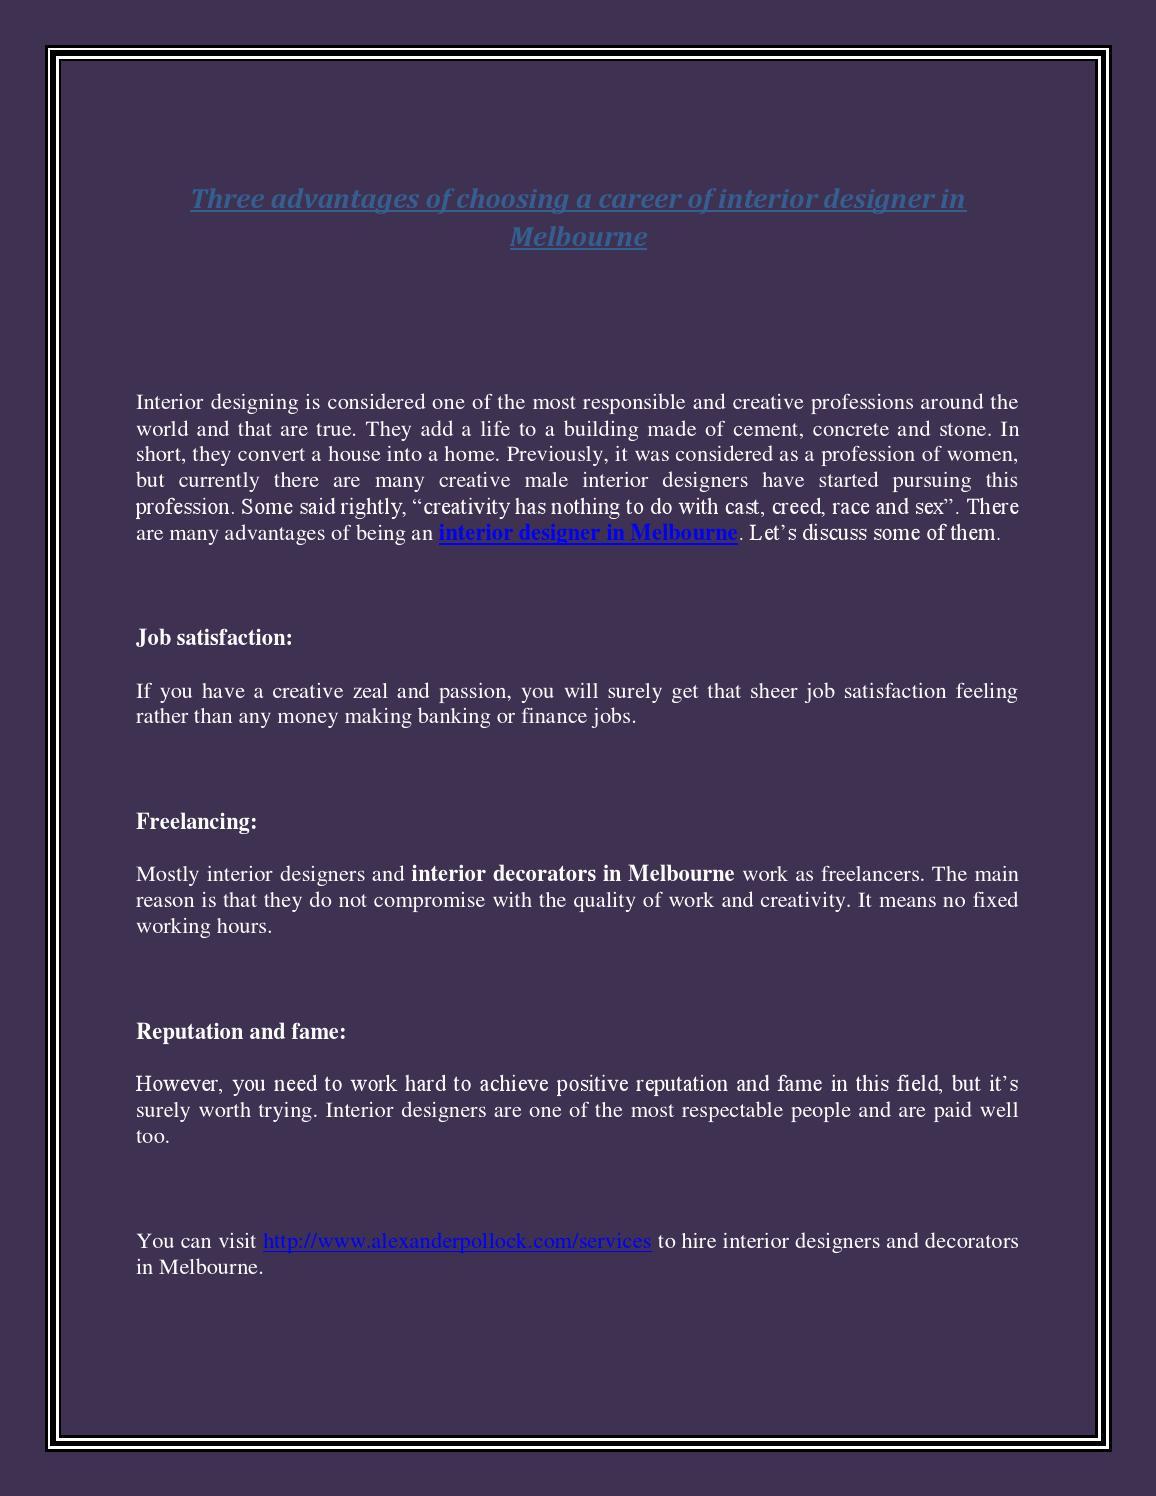 Three advantages of choosing a career of interior designer in melbourne by interiordesignermelbourne issuu